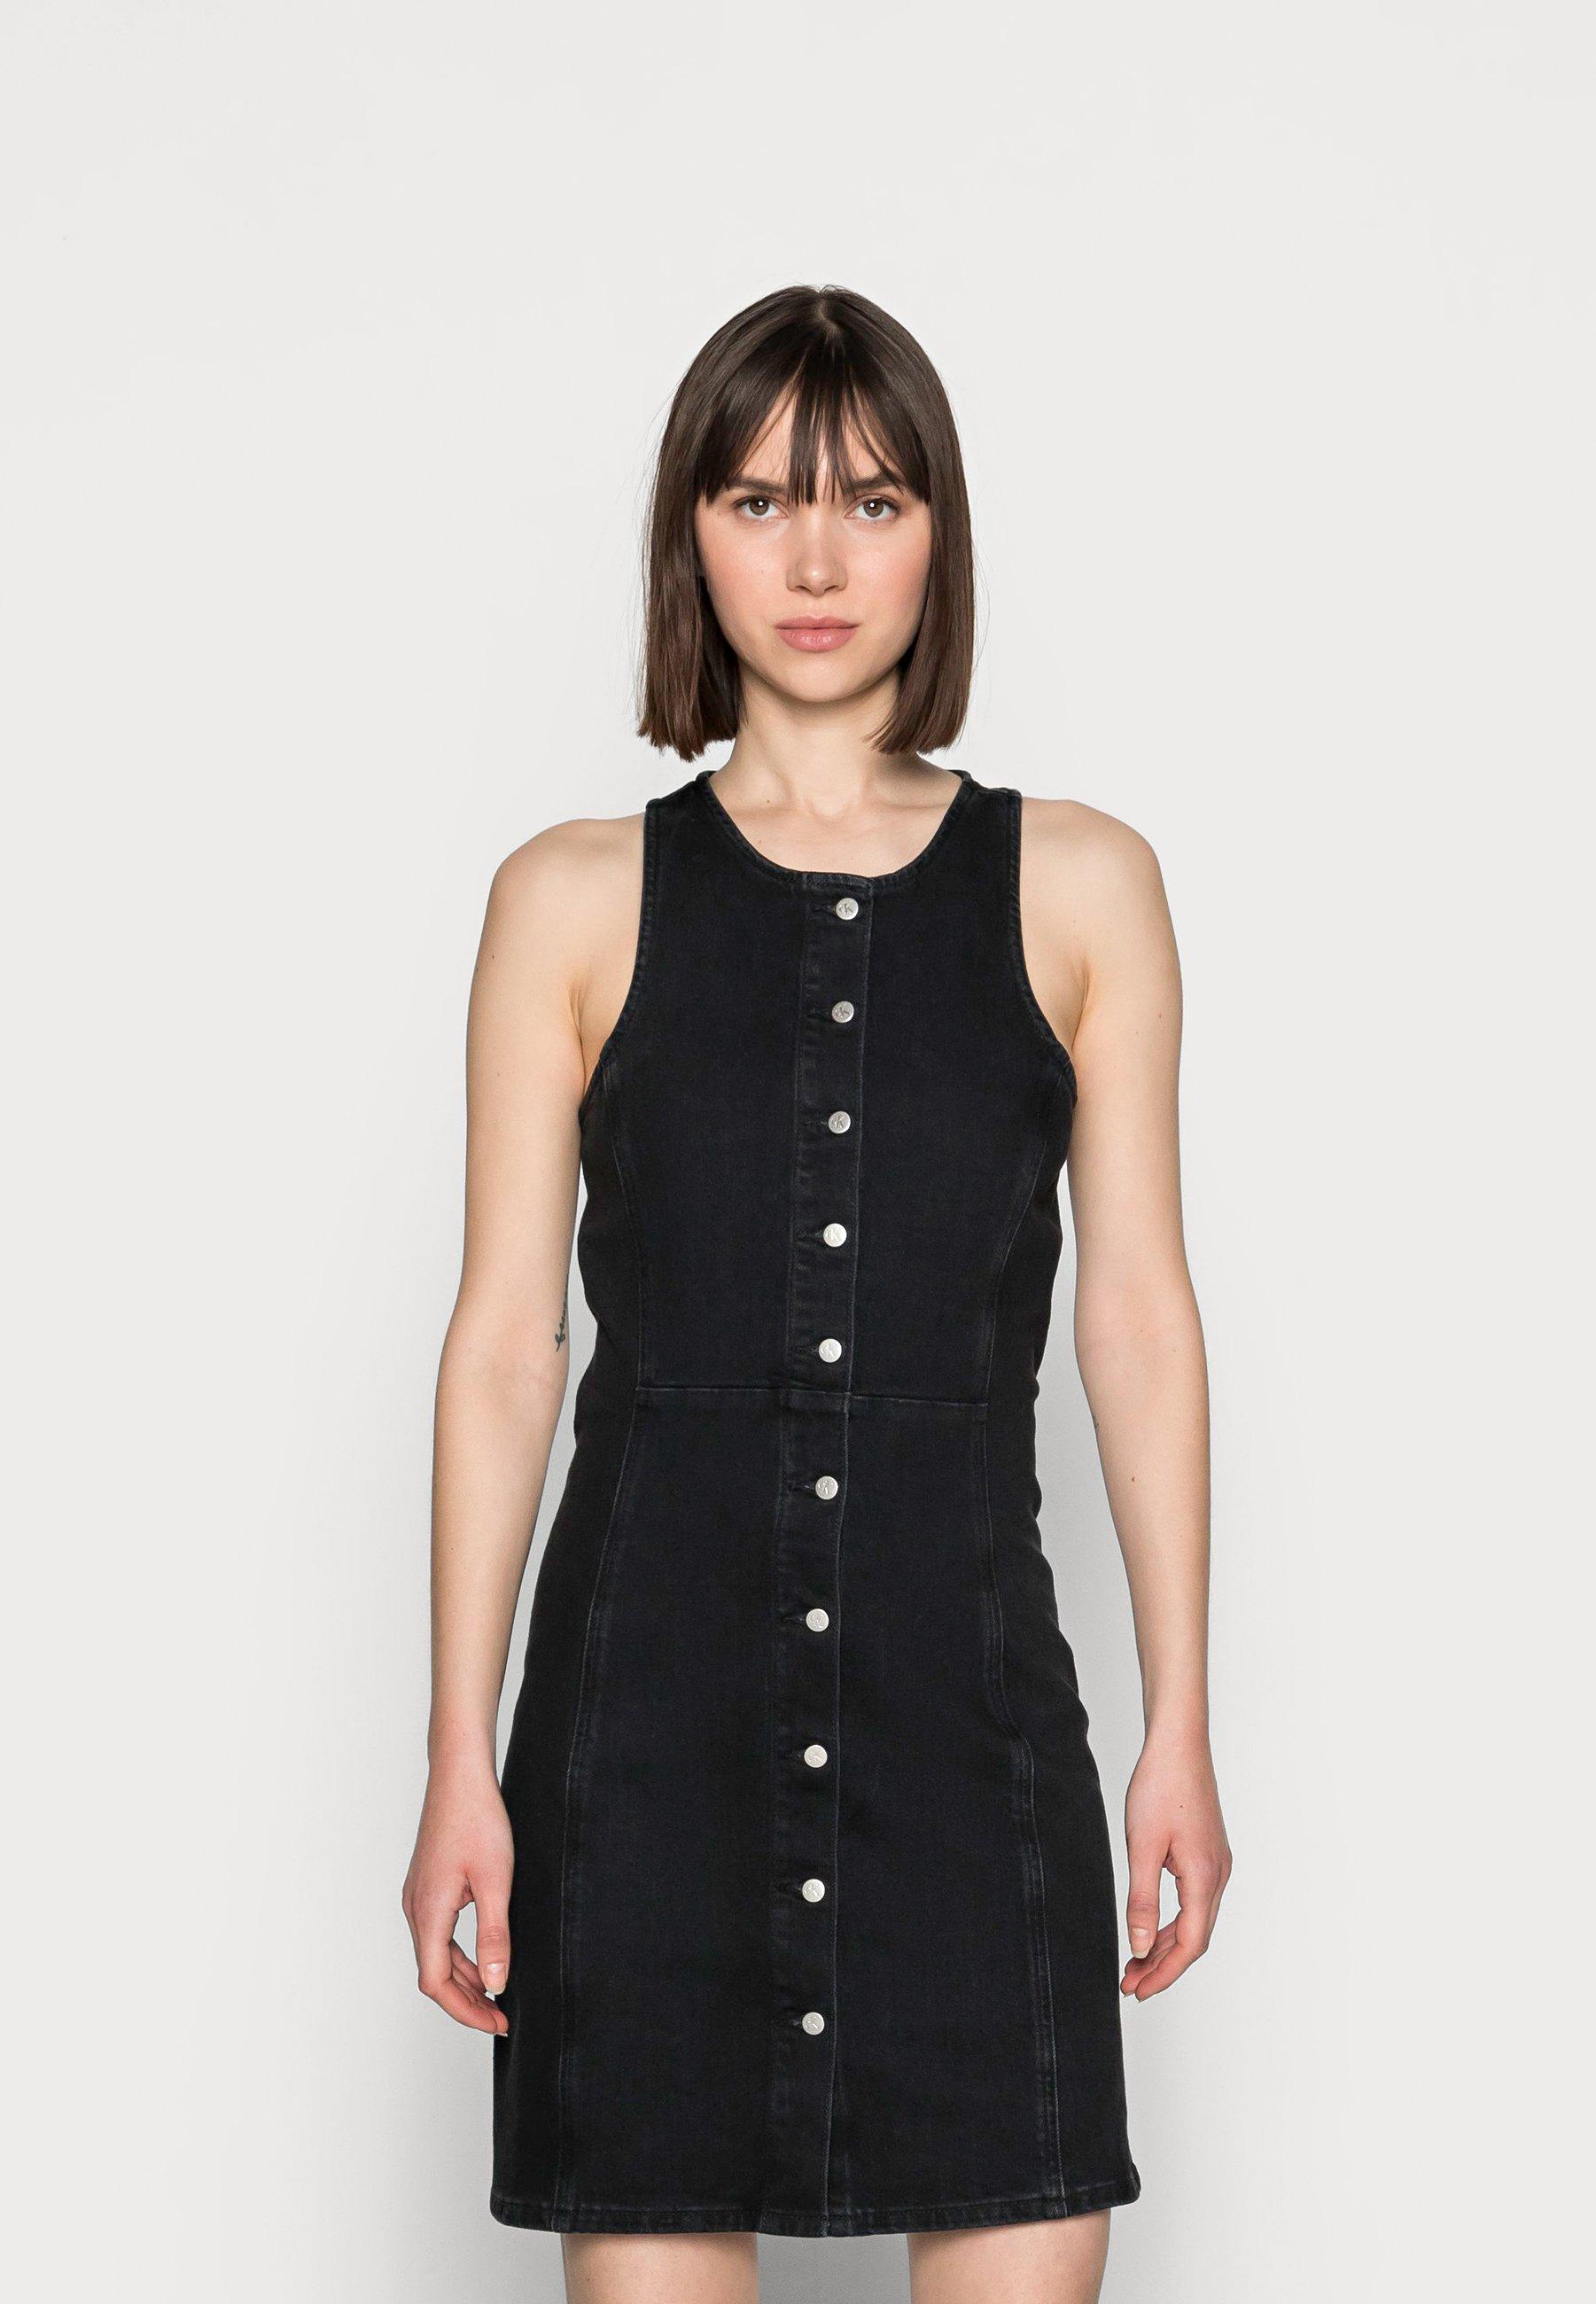 Damer SEAMED BODYCON DRESS - Jeanskjole / cowboykjoler